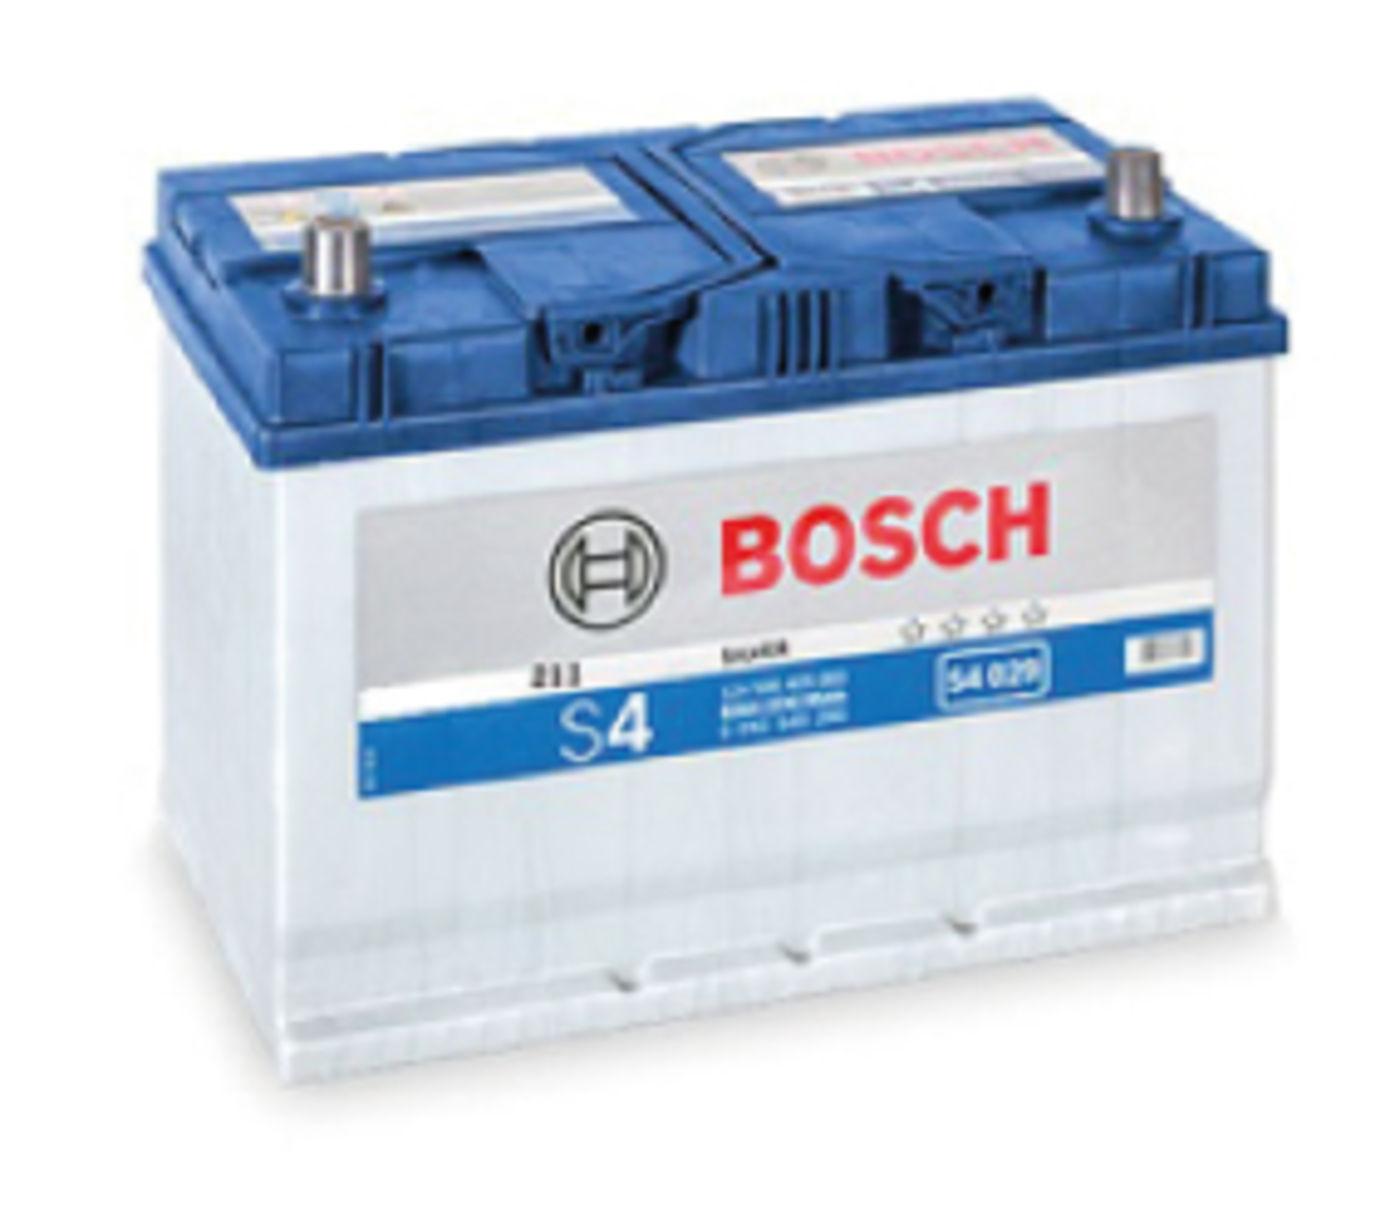 Bosch 34 FE LM